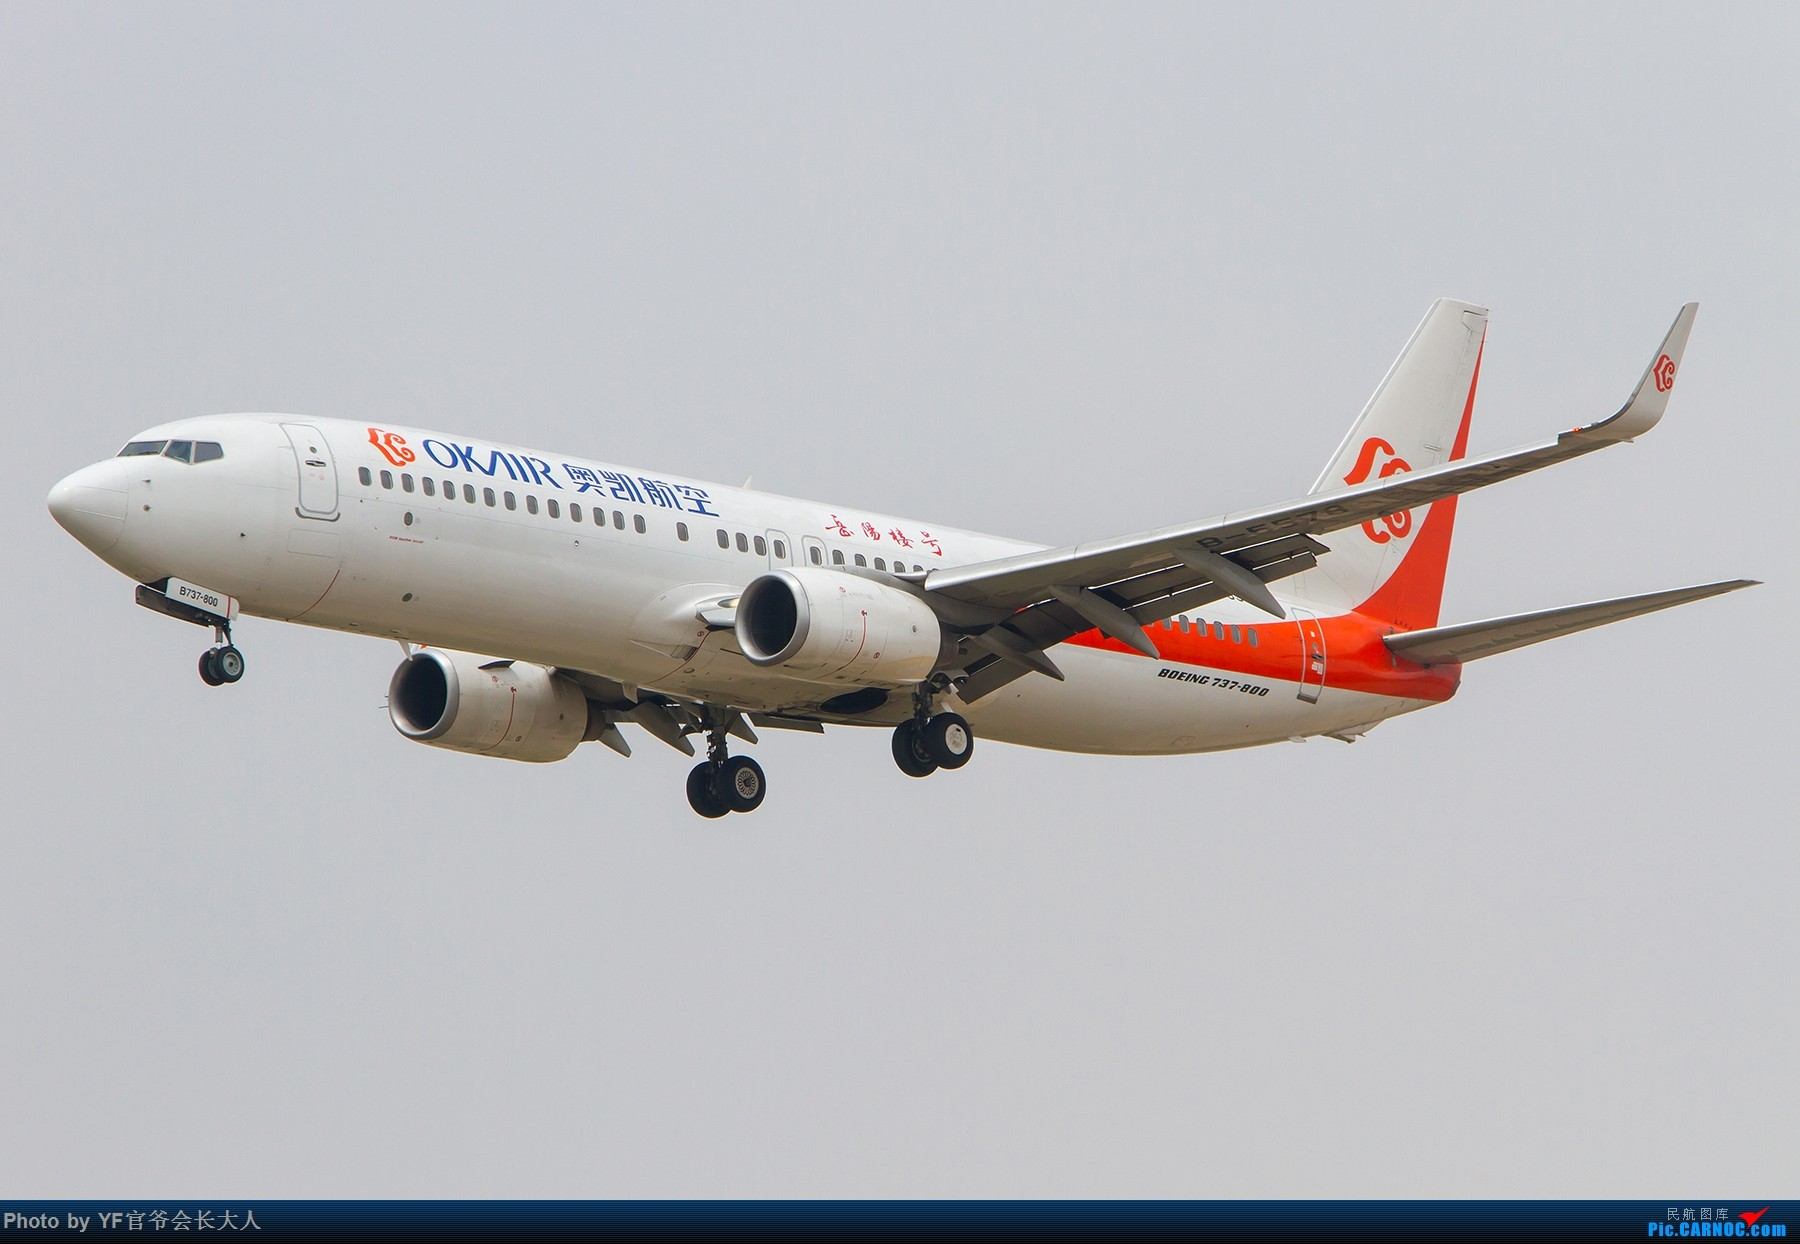 Re:[原创]【ZYTX】轻易不拍机,拍就要拍个过瘾!(新开的酷鸟,亚洲大西洋,顺带碰上朝韩两国的好货) BOEING 737-800 B-5578 中国沈阳桃仙国际机场